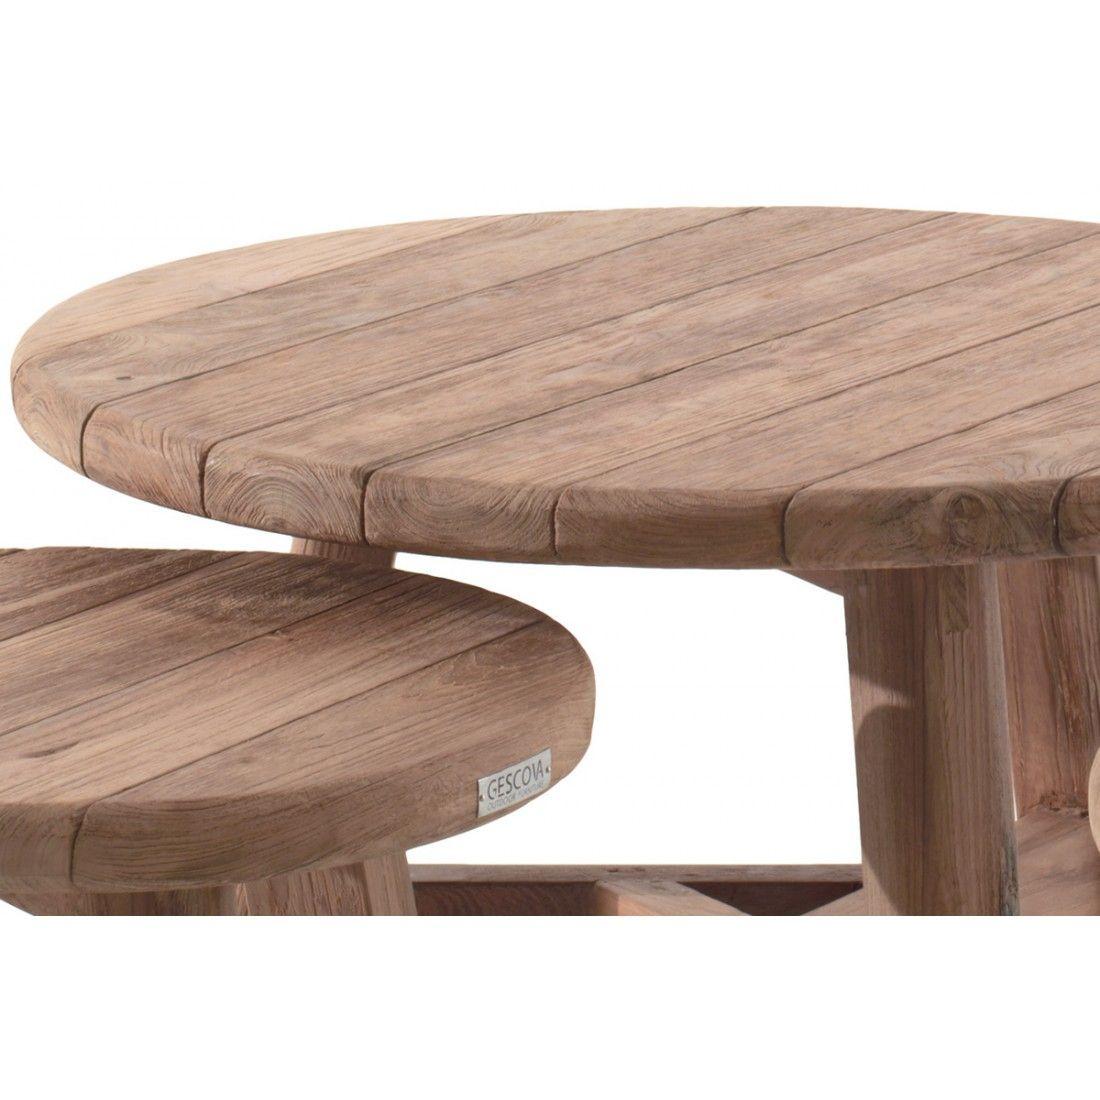 Table de jardin basse et ronde en teck recyclé